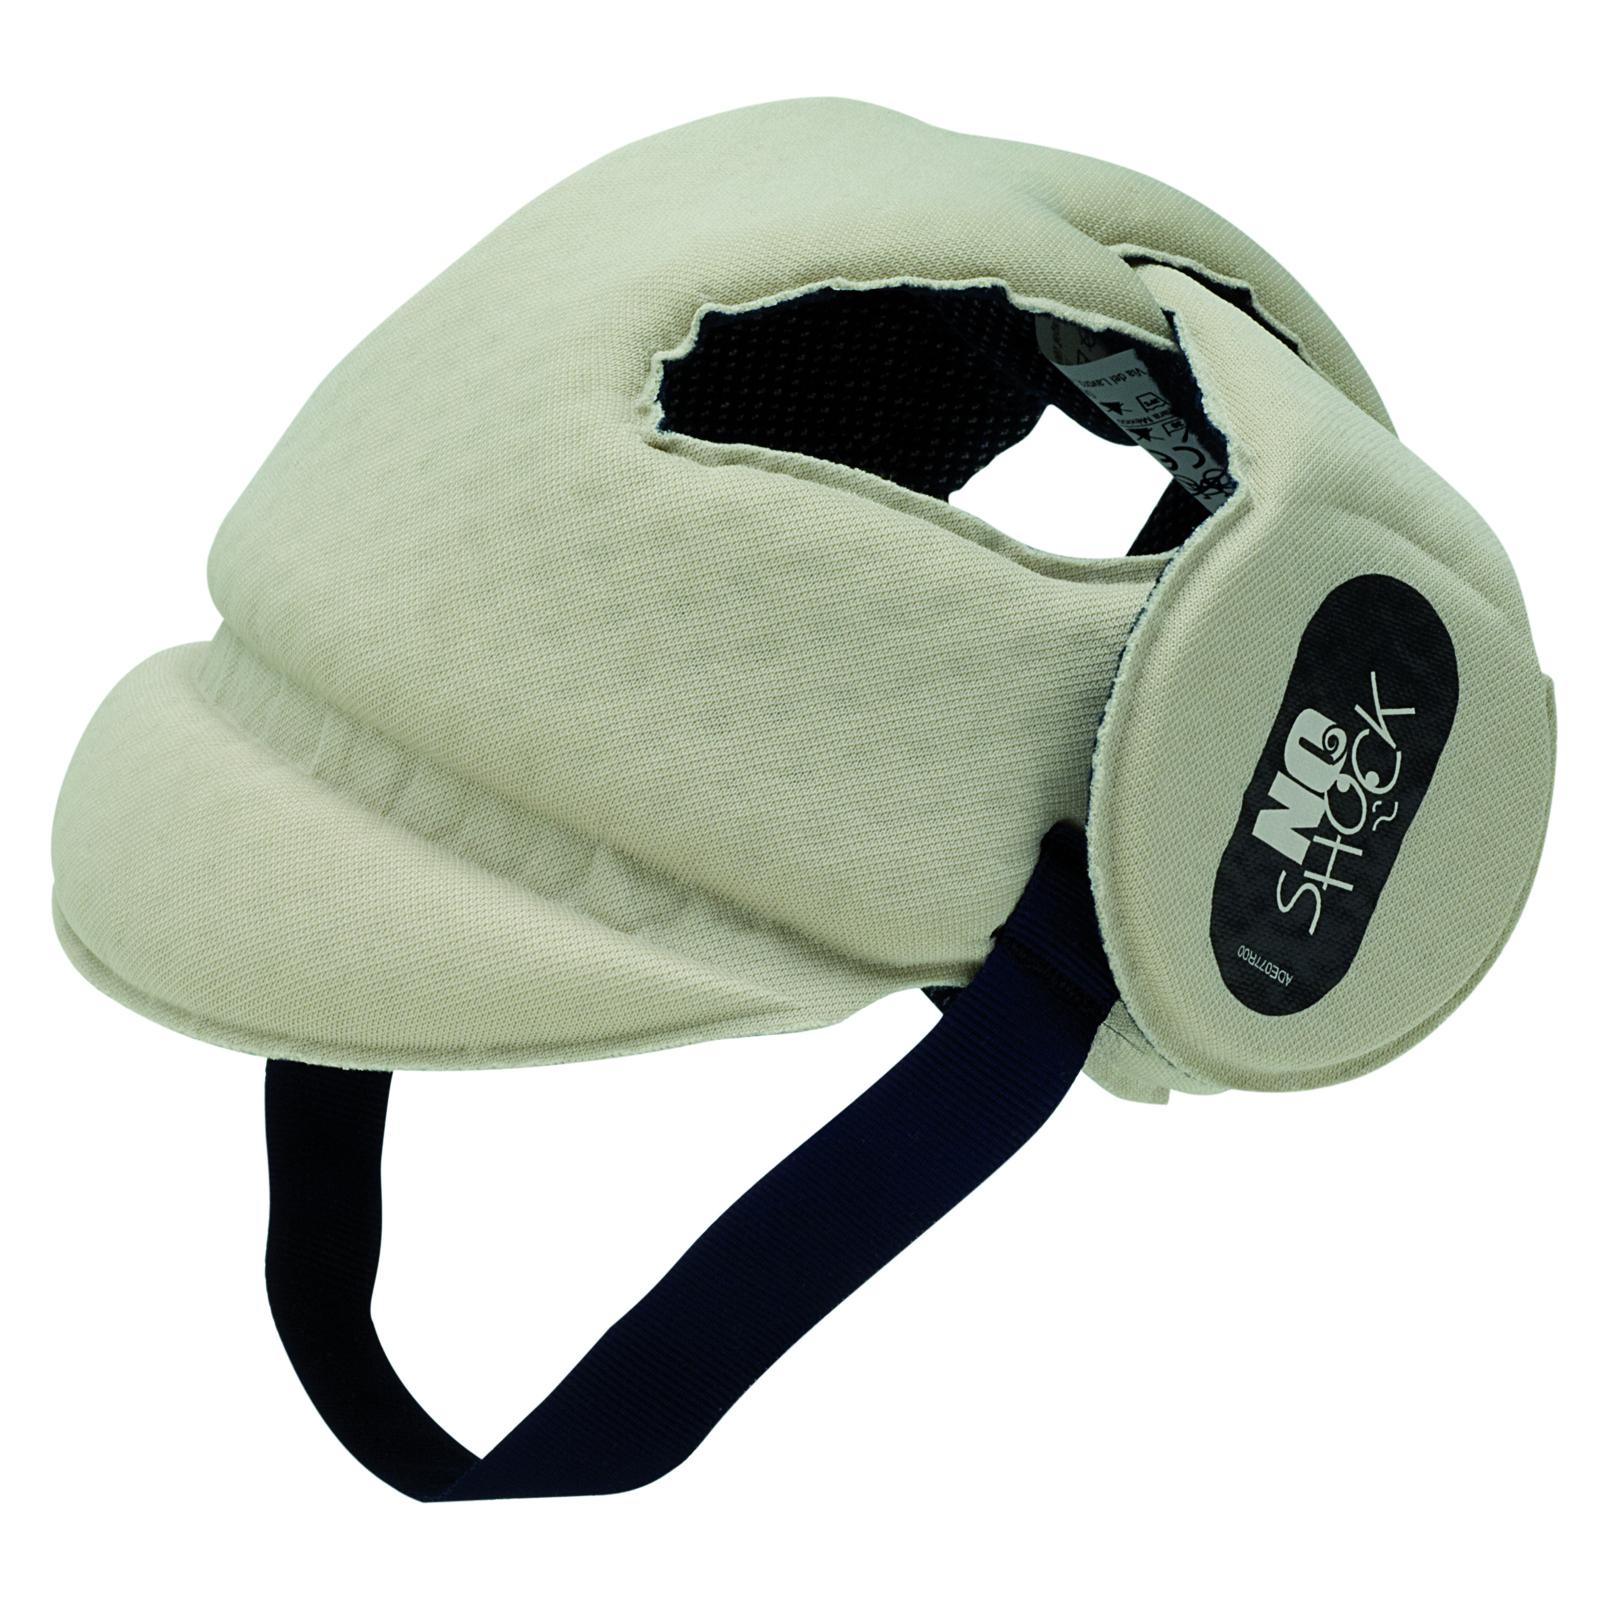 Шлем OK Baby No Shok для защиты от падений 8-20 мес<br>